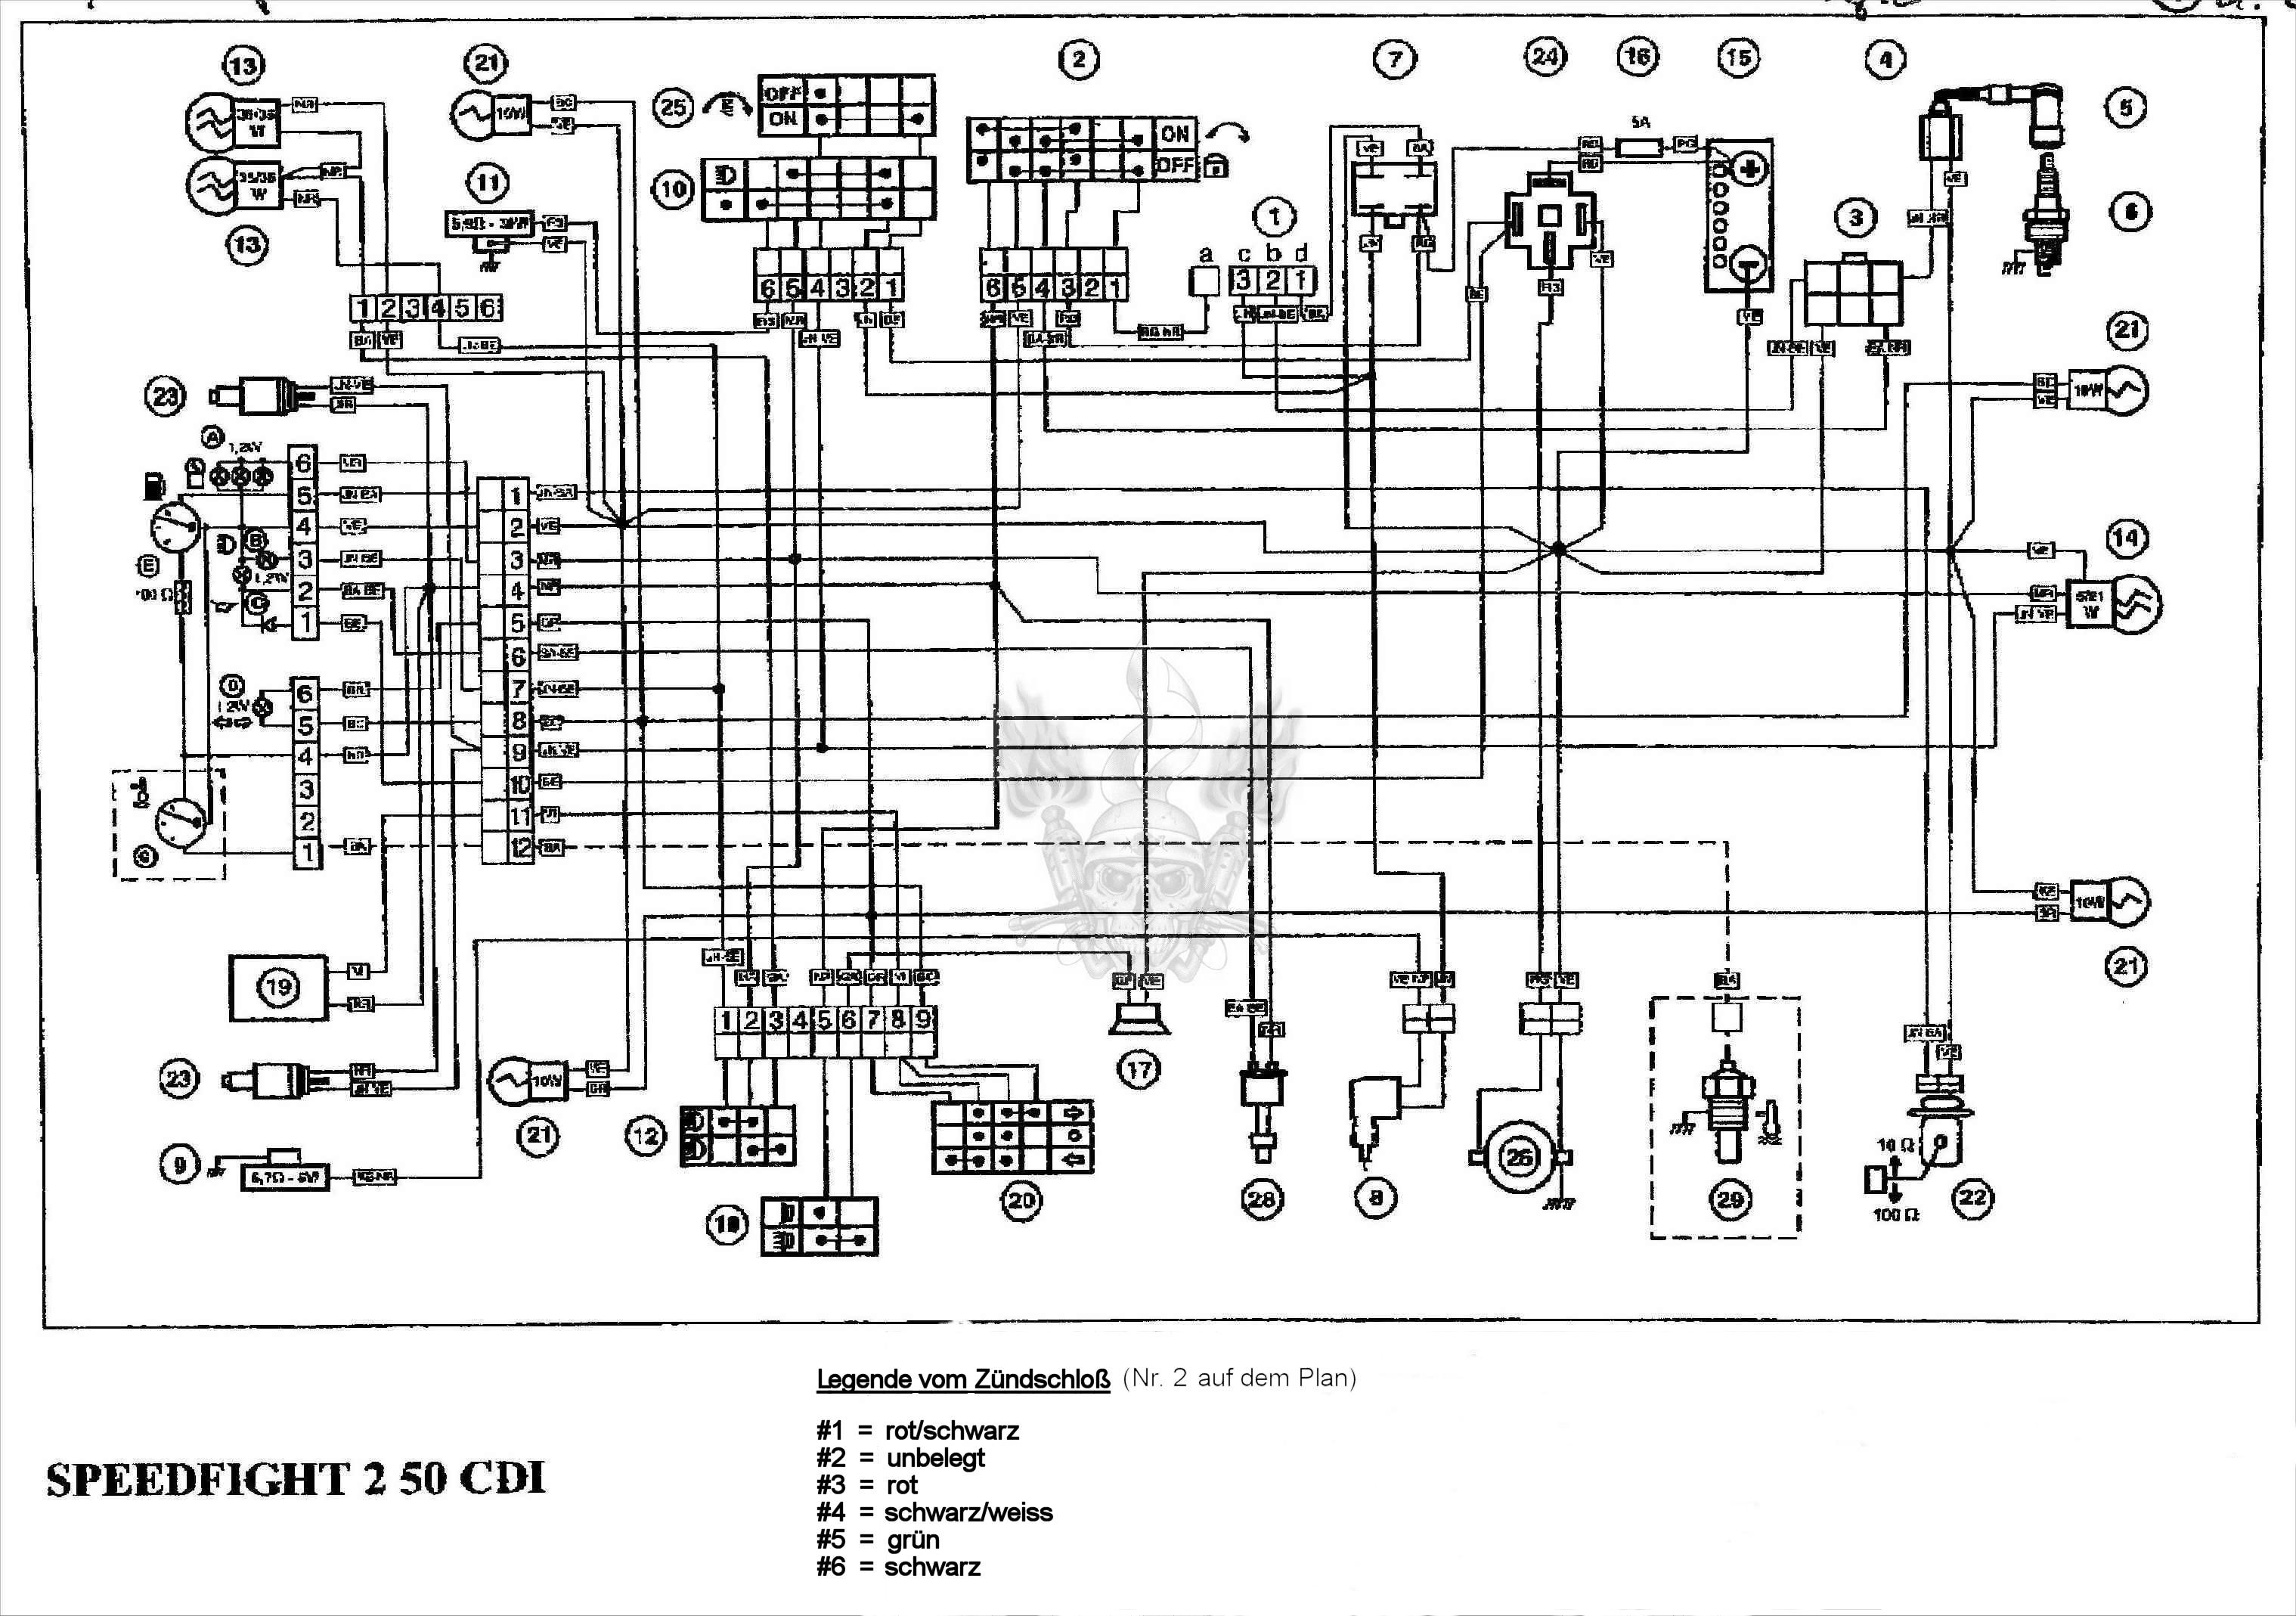 Peugeot Elyseo Wiring Diagram on peugeot xr6, peugeot jetforce, peugeot squab, peugeot vivacity,